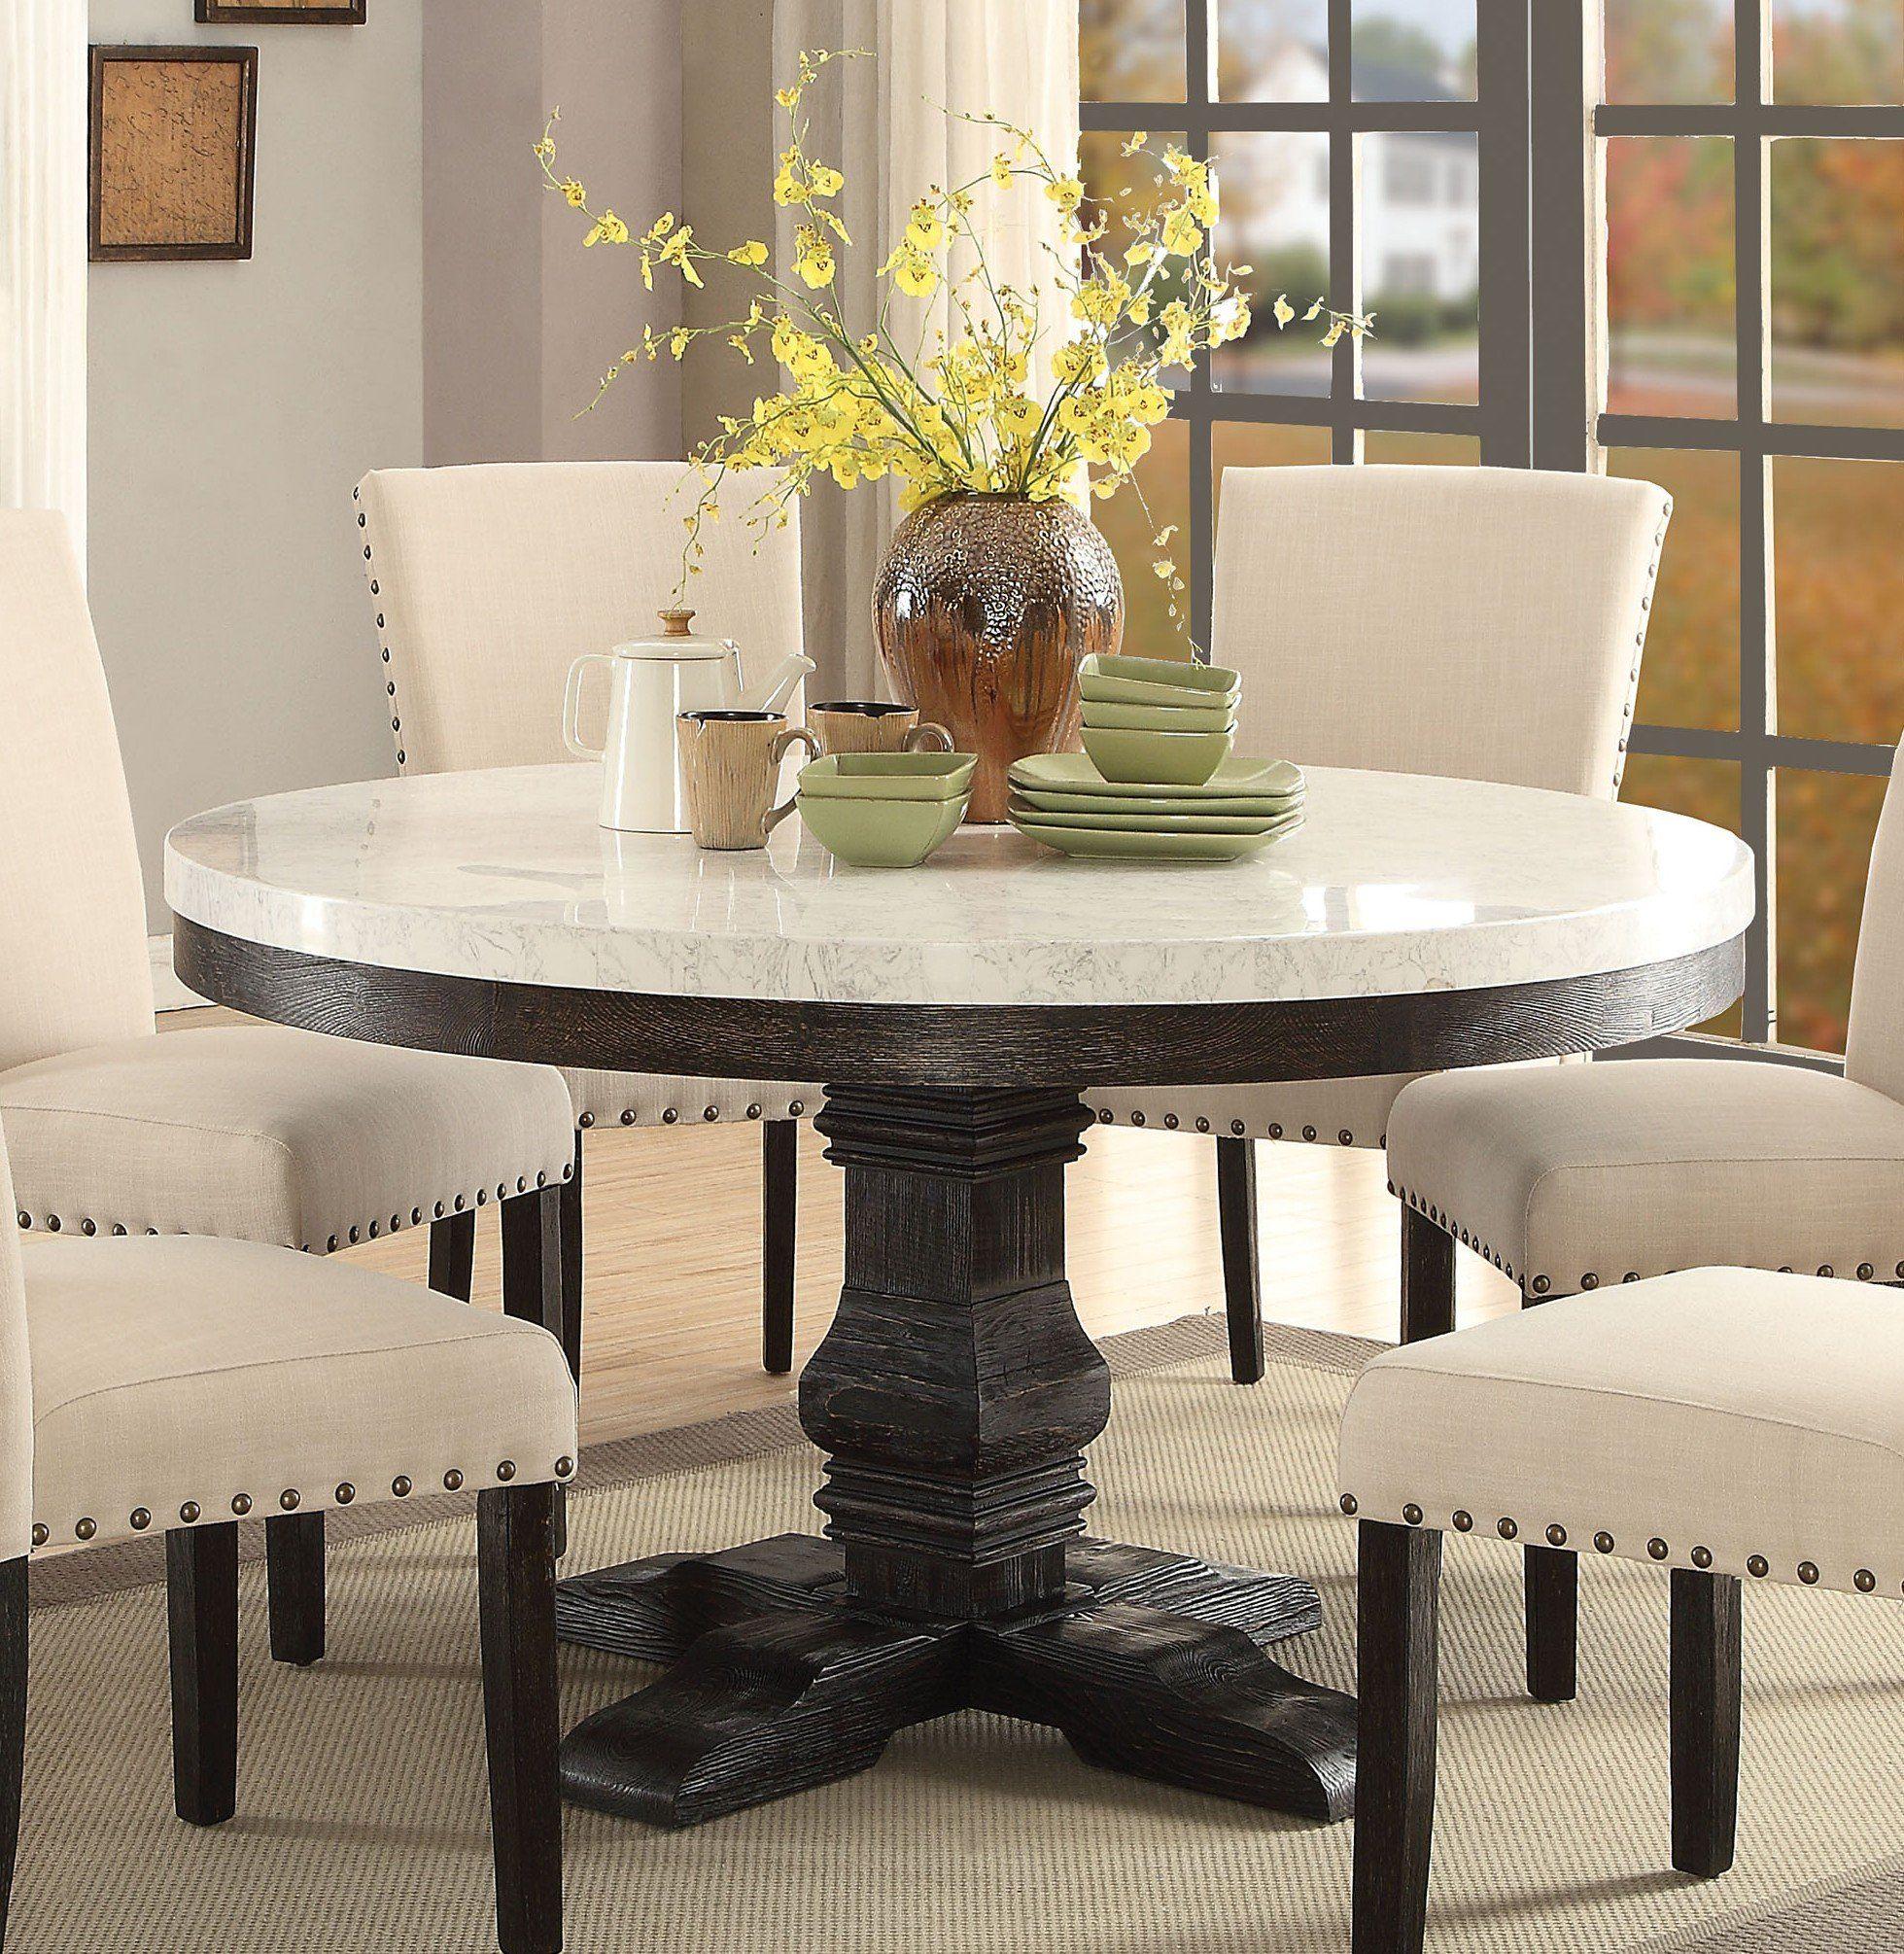 Acme 72845 Nolan White Marble Top Round Dining Table Round